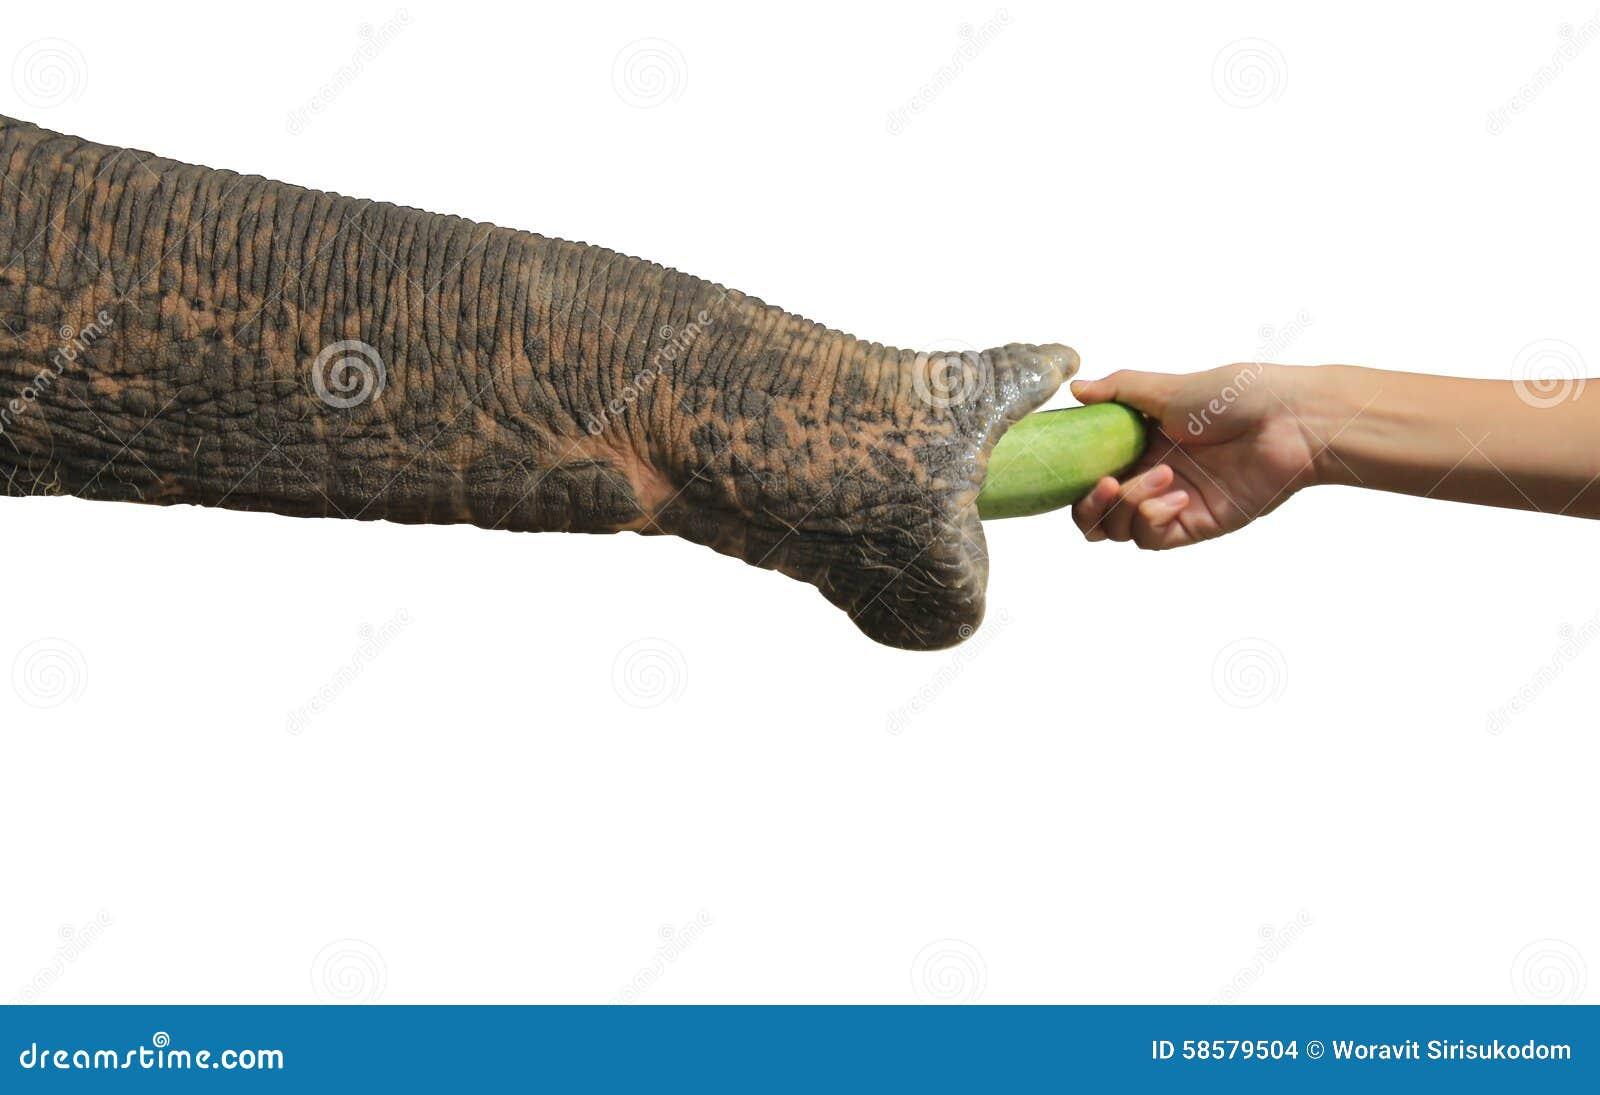 Nose elephant take food of Nose